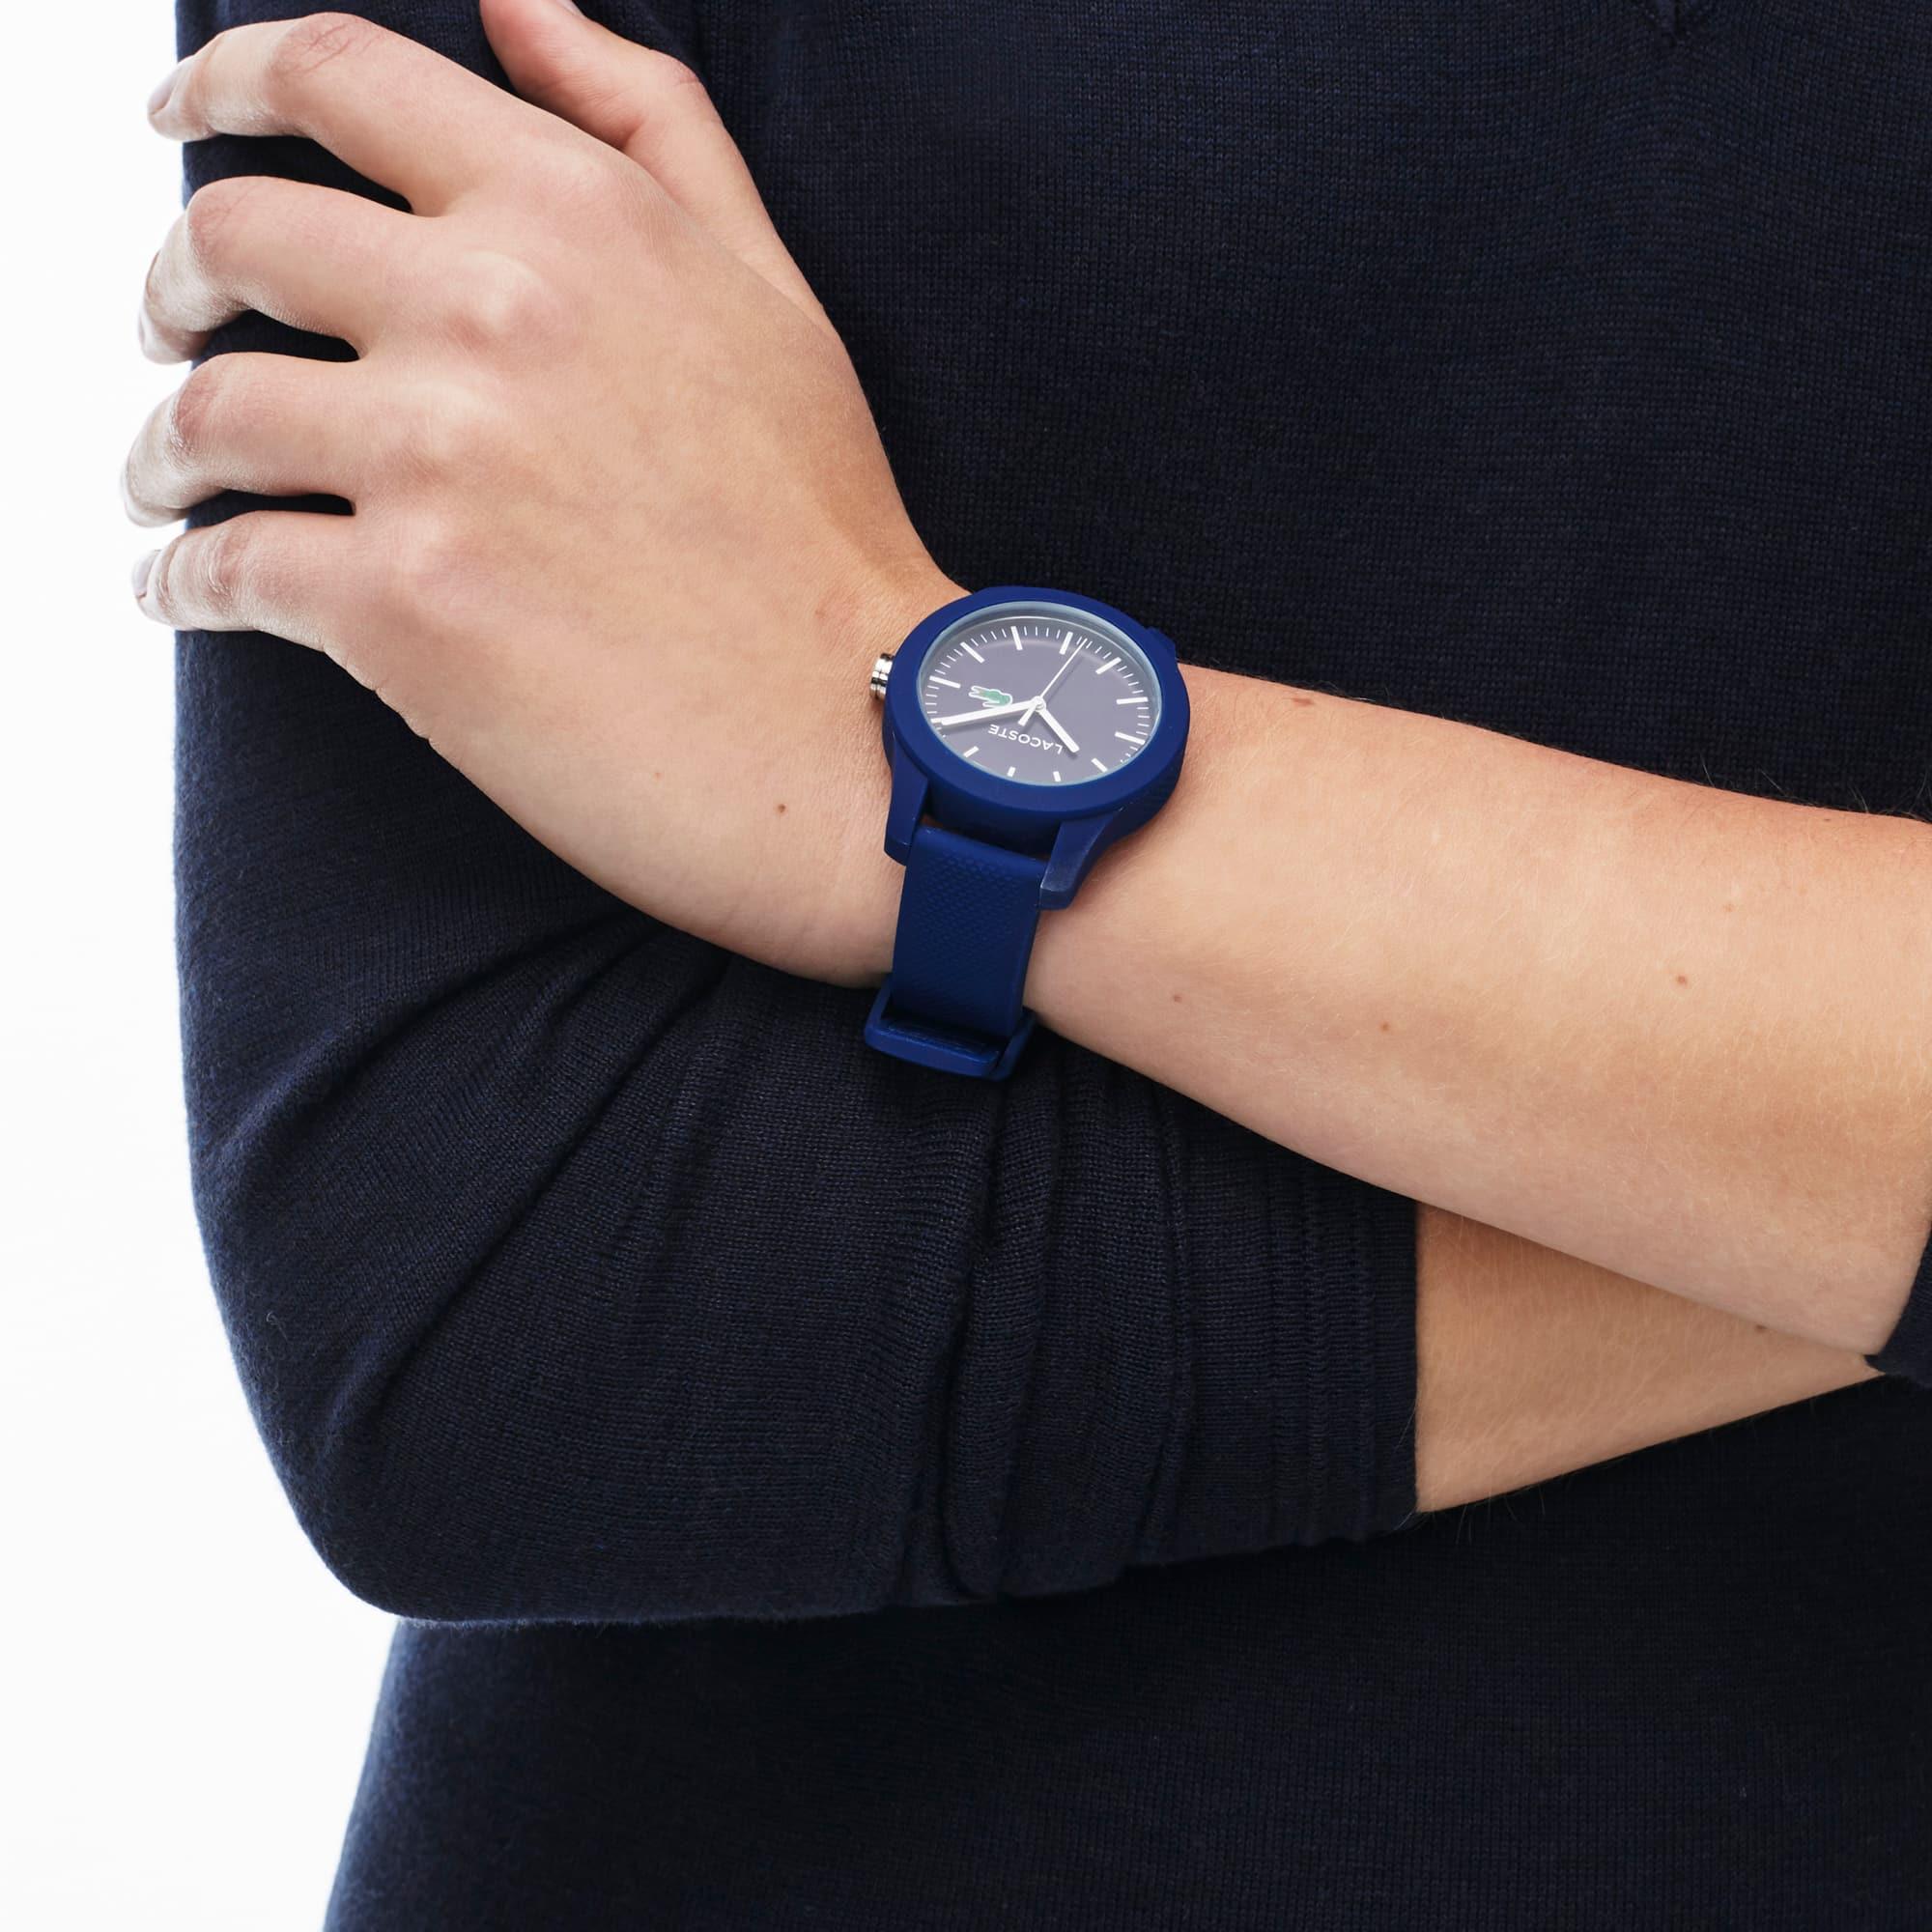 LACOSTE 12.12 Damenuhr mit blauem Silikon Armband